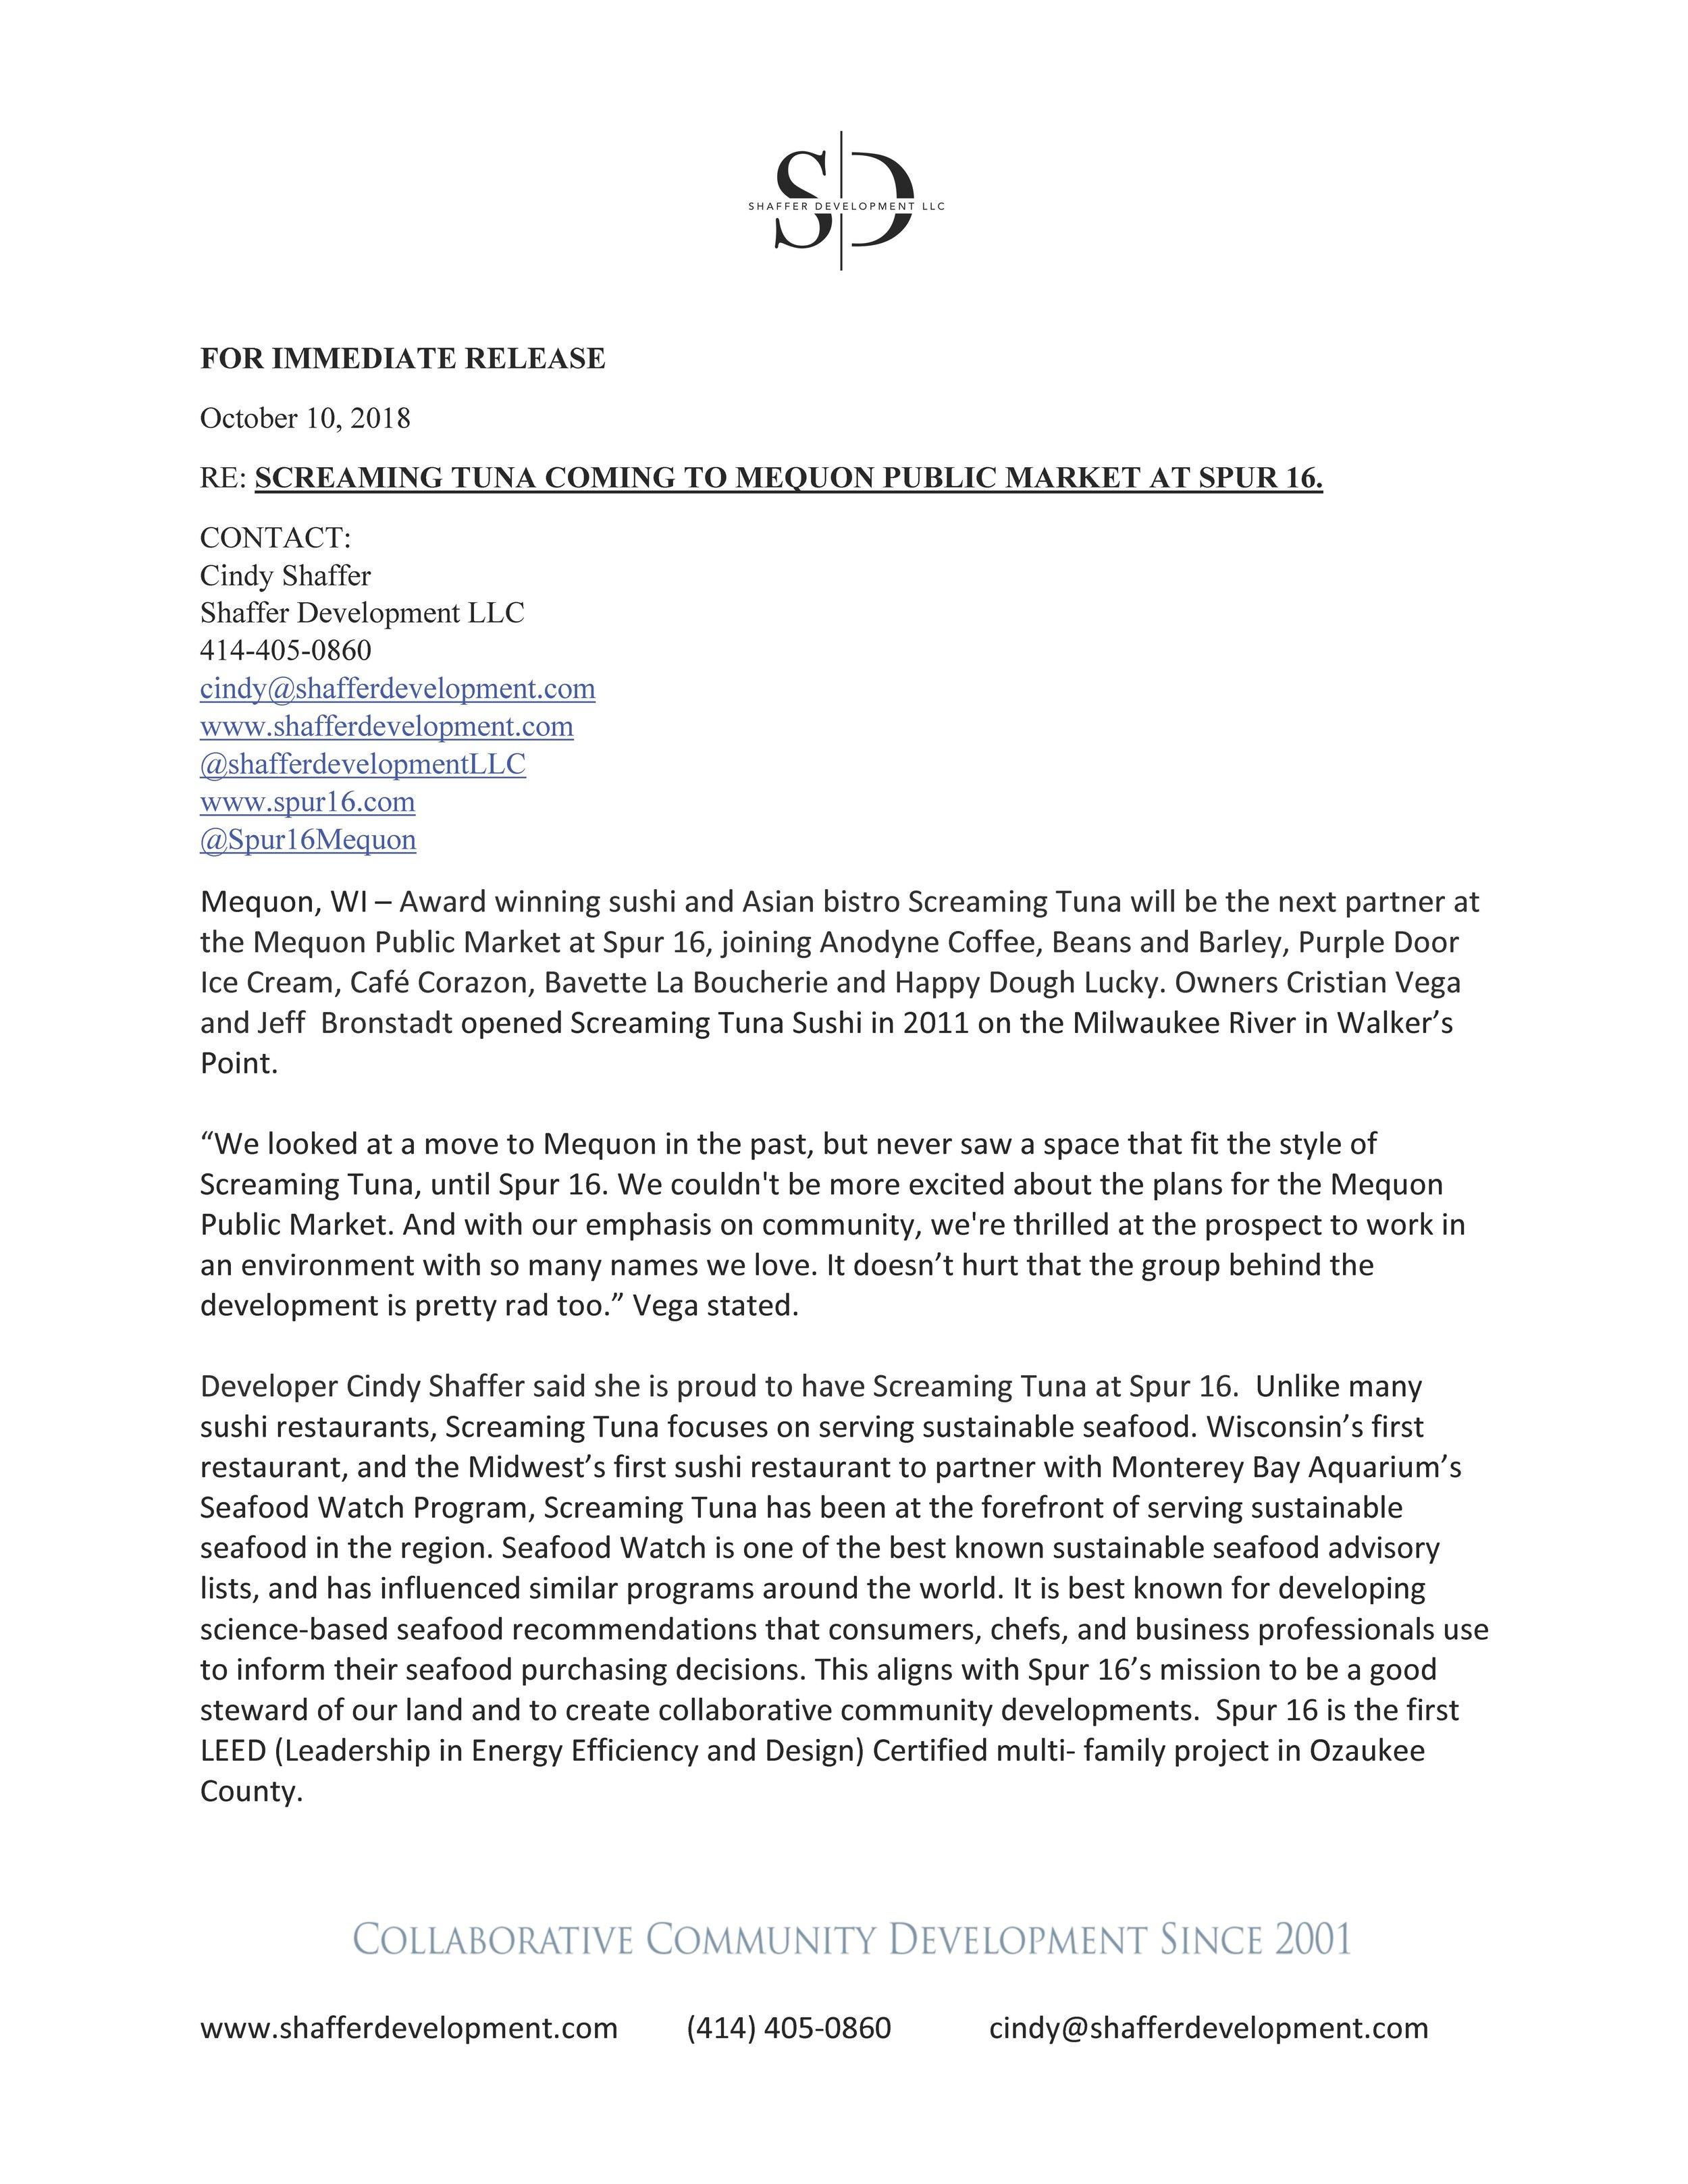 Screaming Tuna Press Release_Page_1.jpg